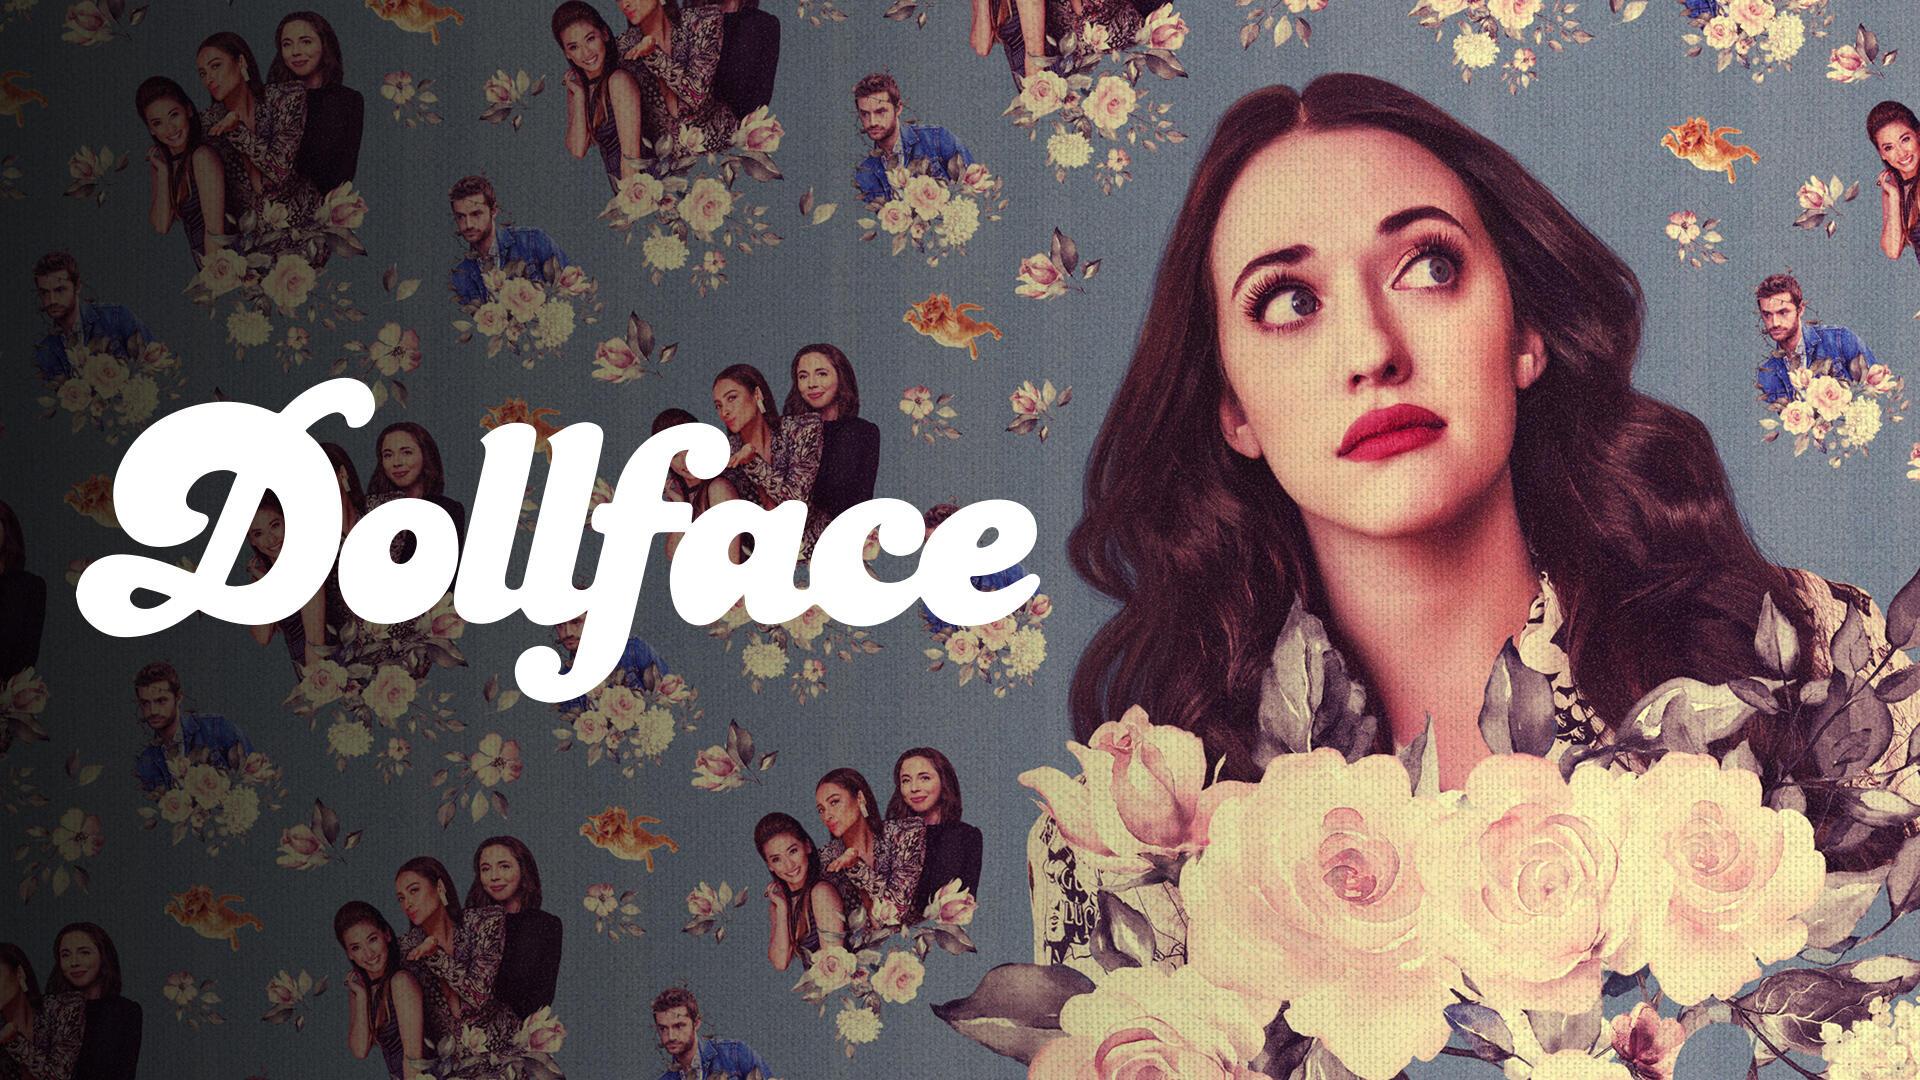 Dollface_16x9